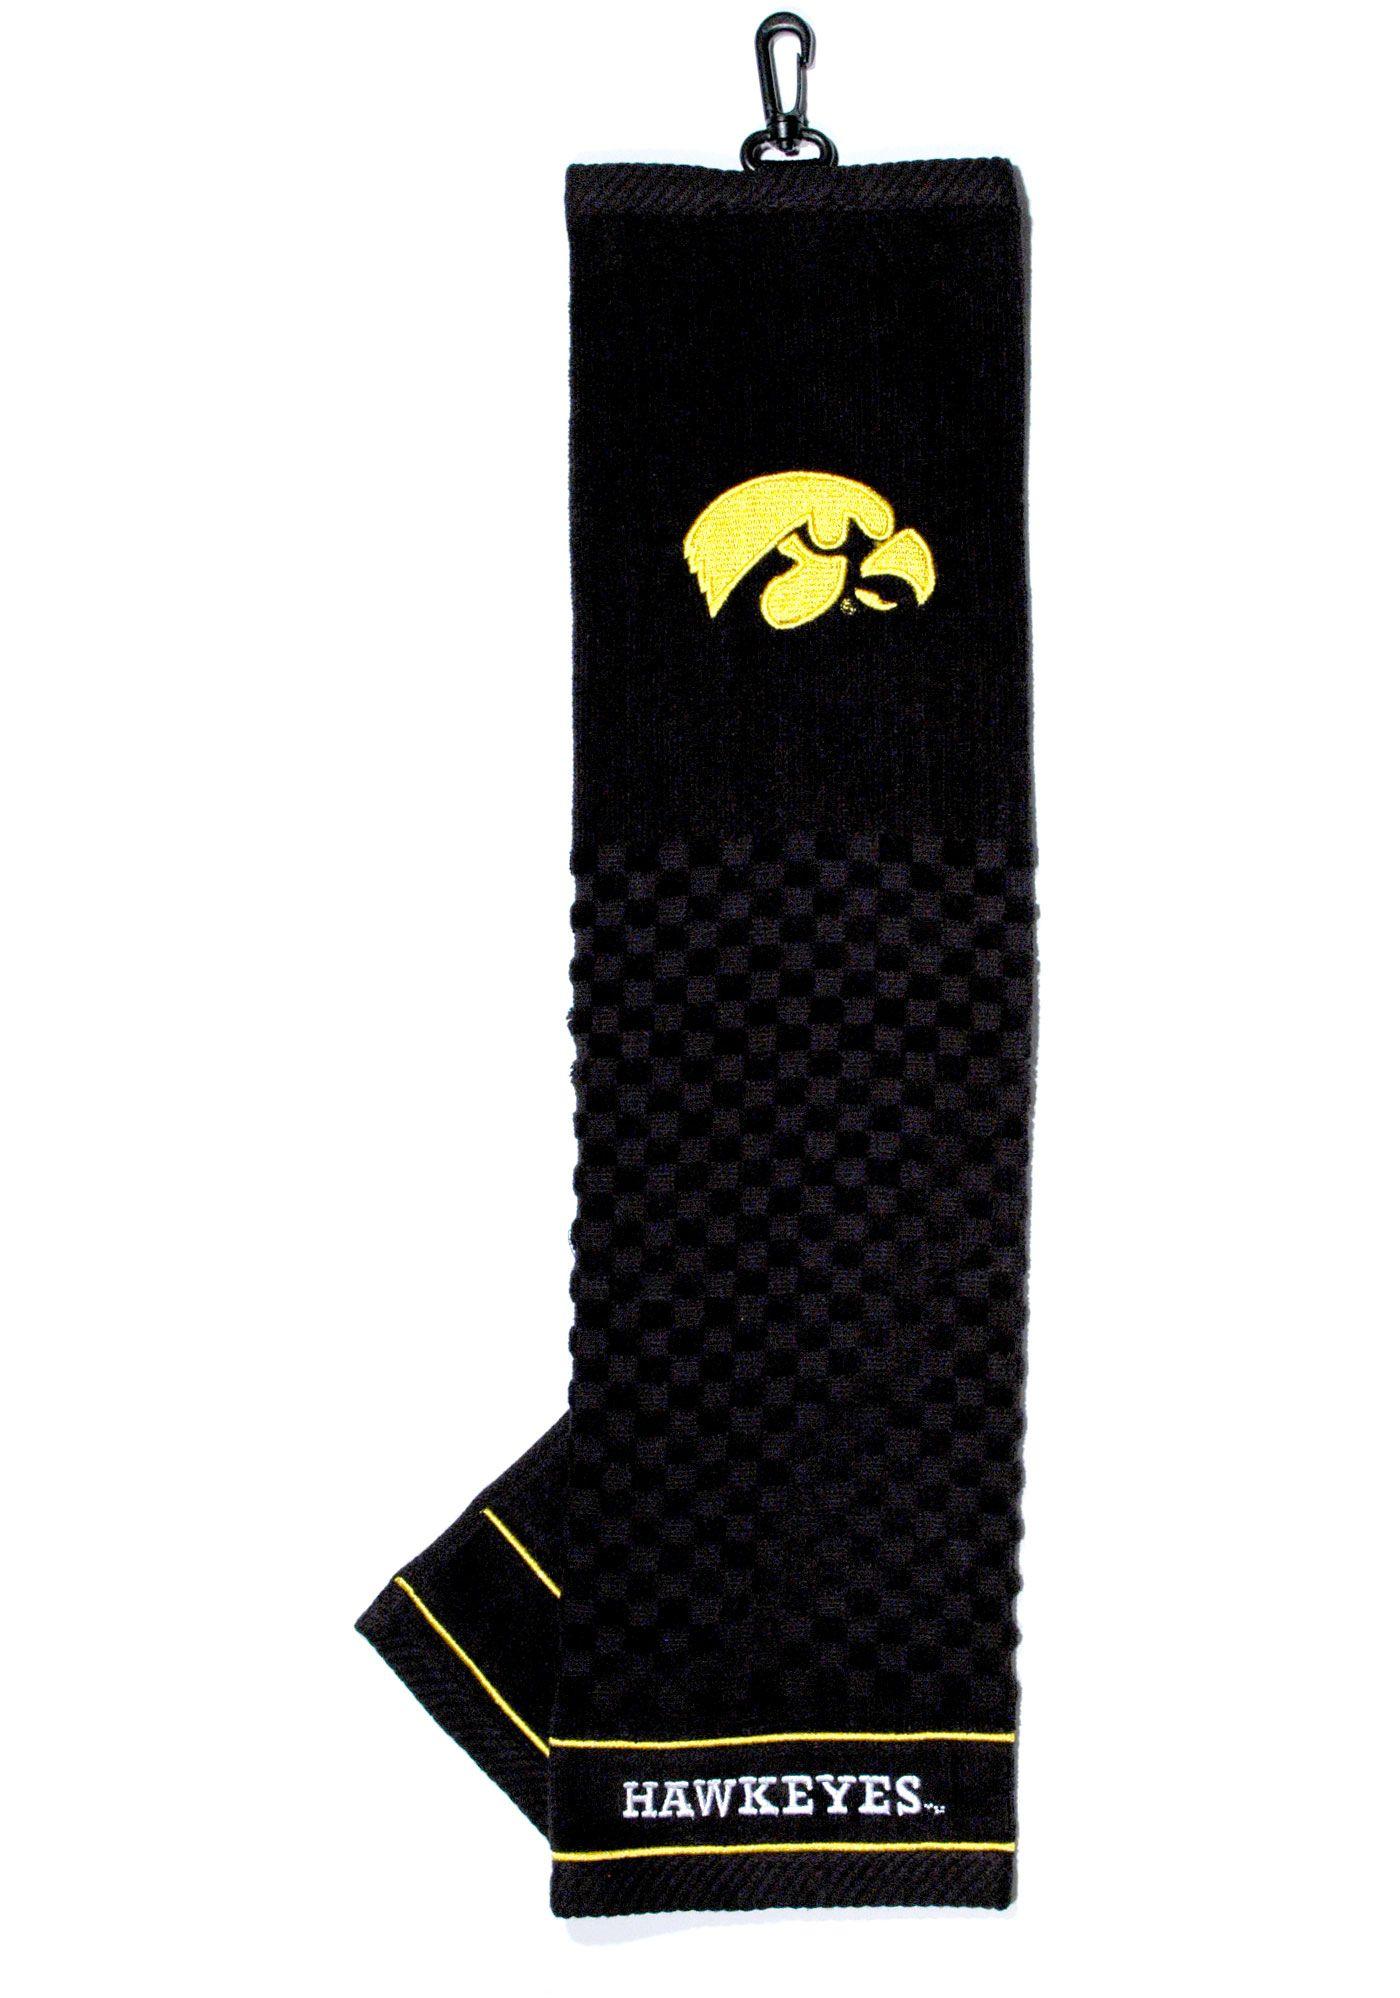 Team Golf Iowa Hawkeyes Embroidered Towel